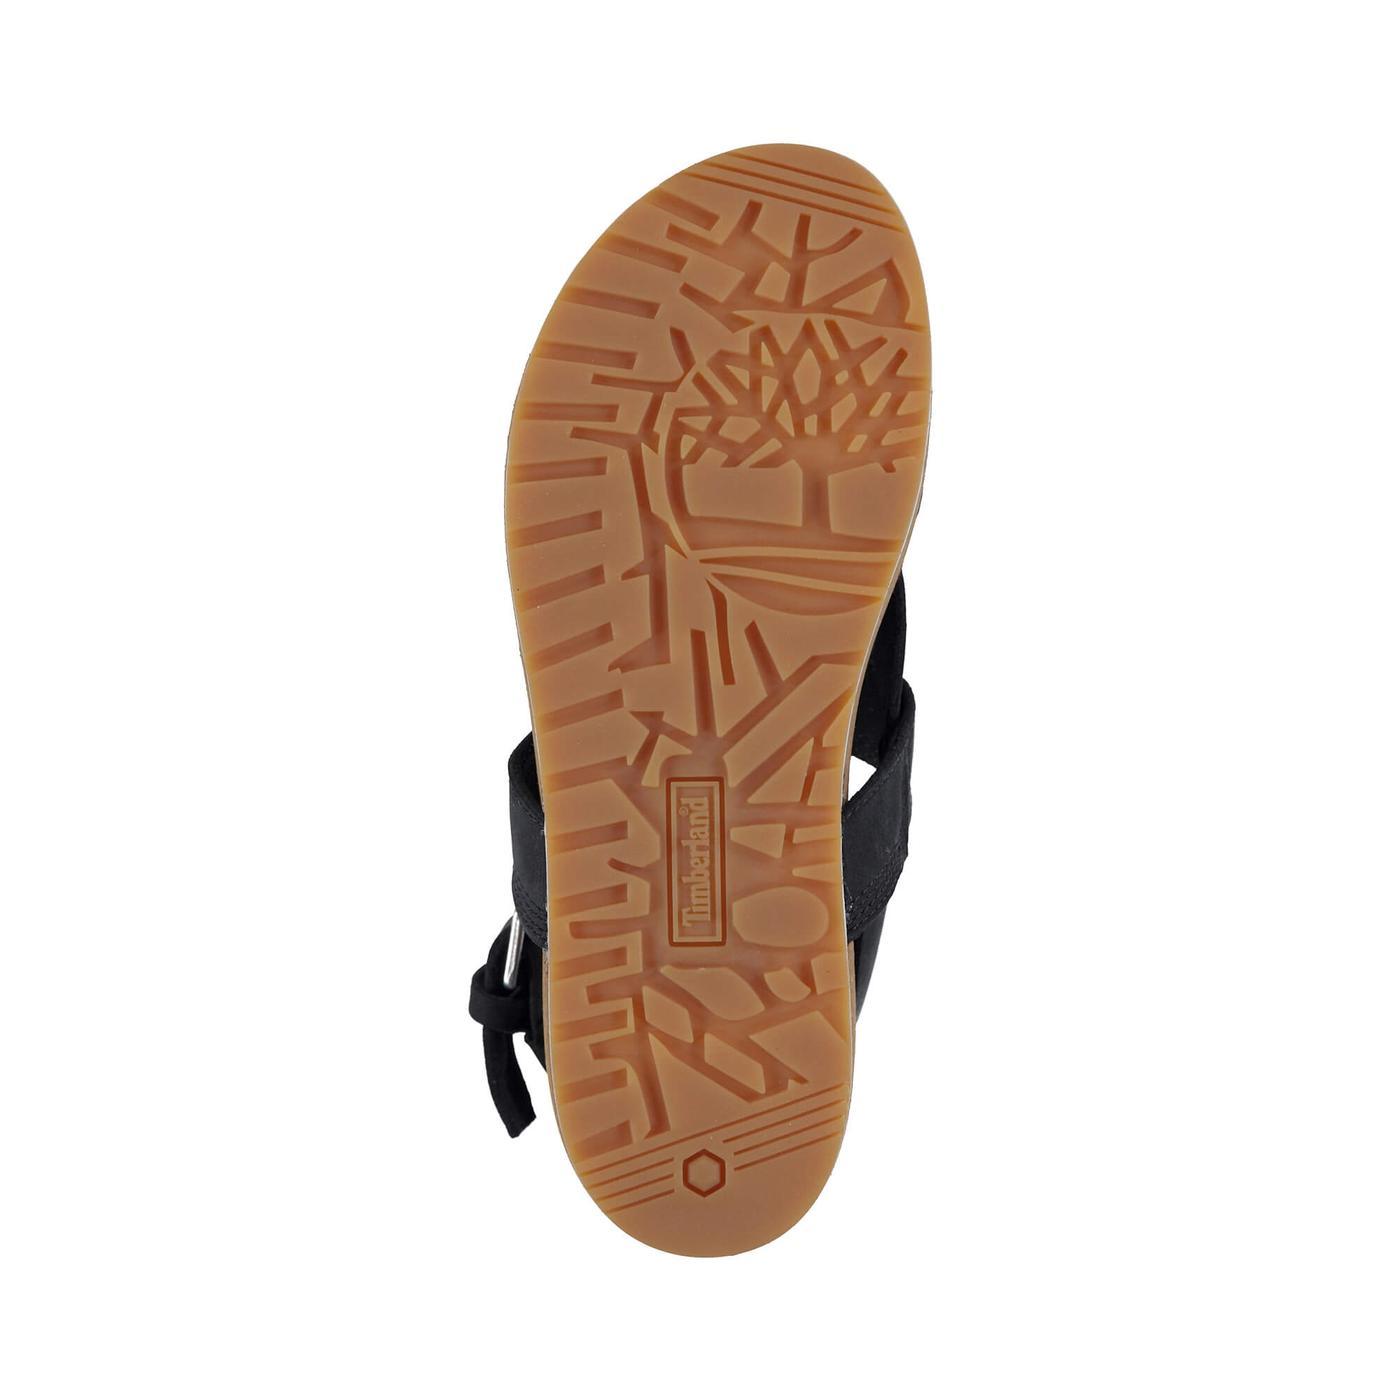 Timberland Malibu Waves Kadın Siyah Sandalet